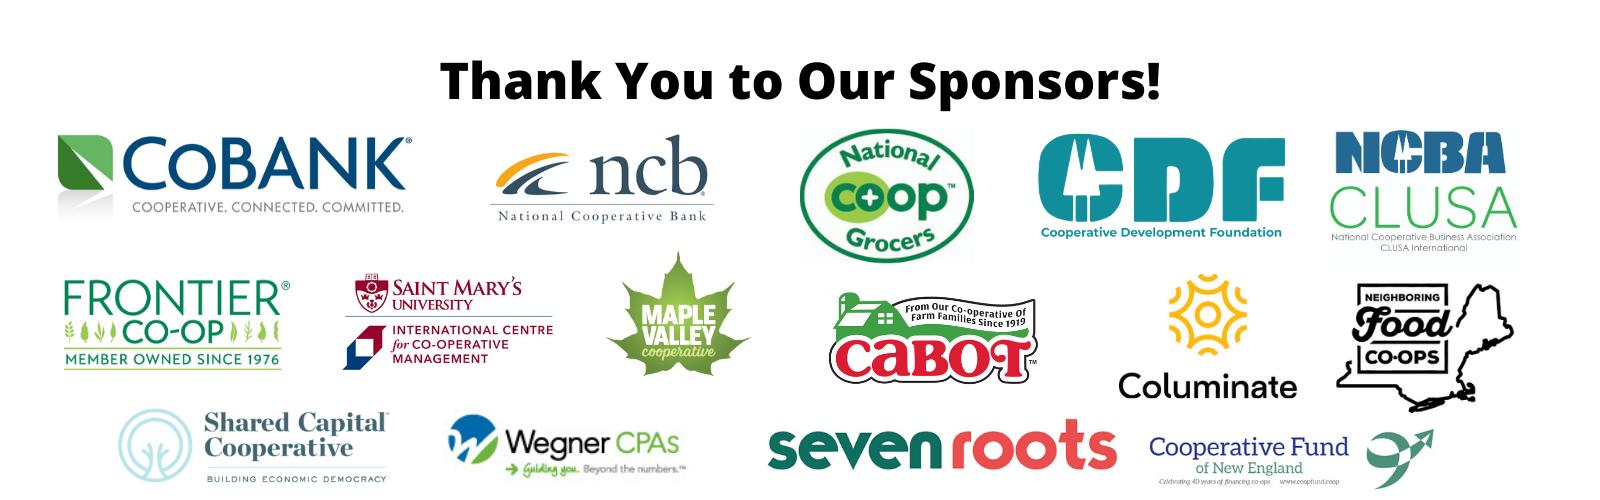 logos of CCMA 2020 sponsors